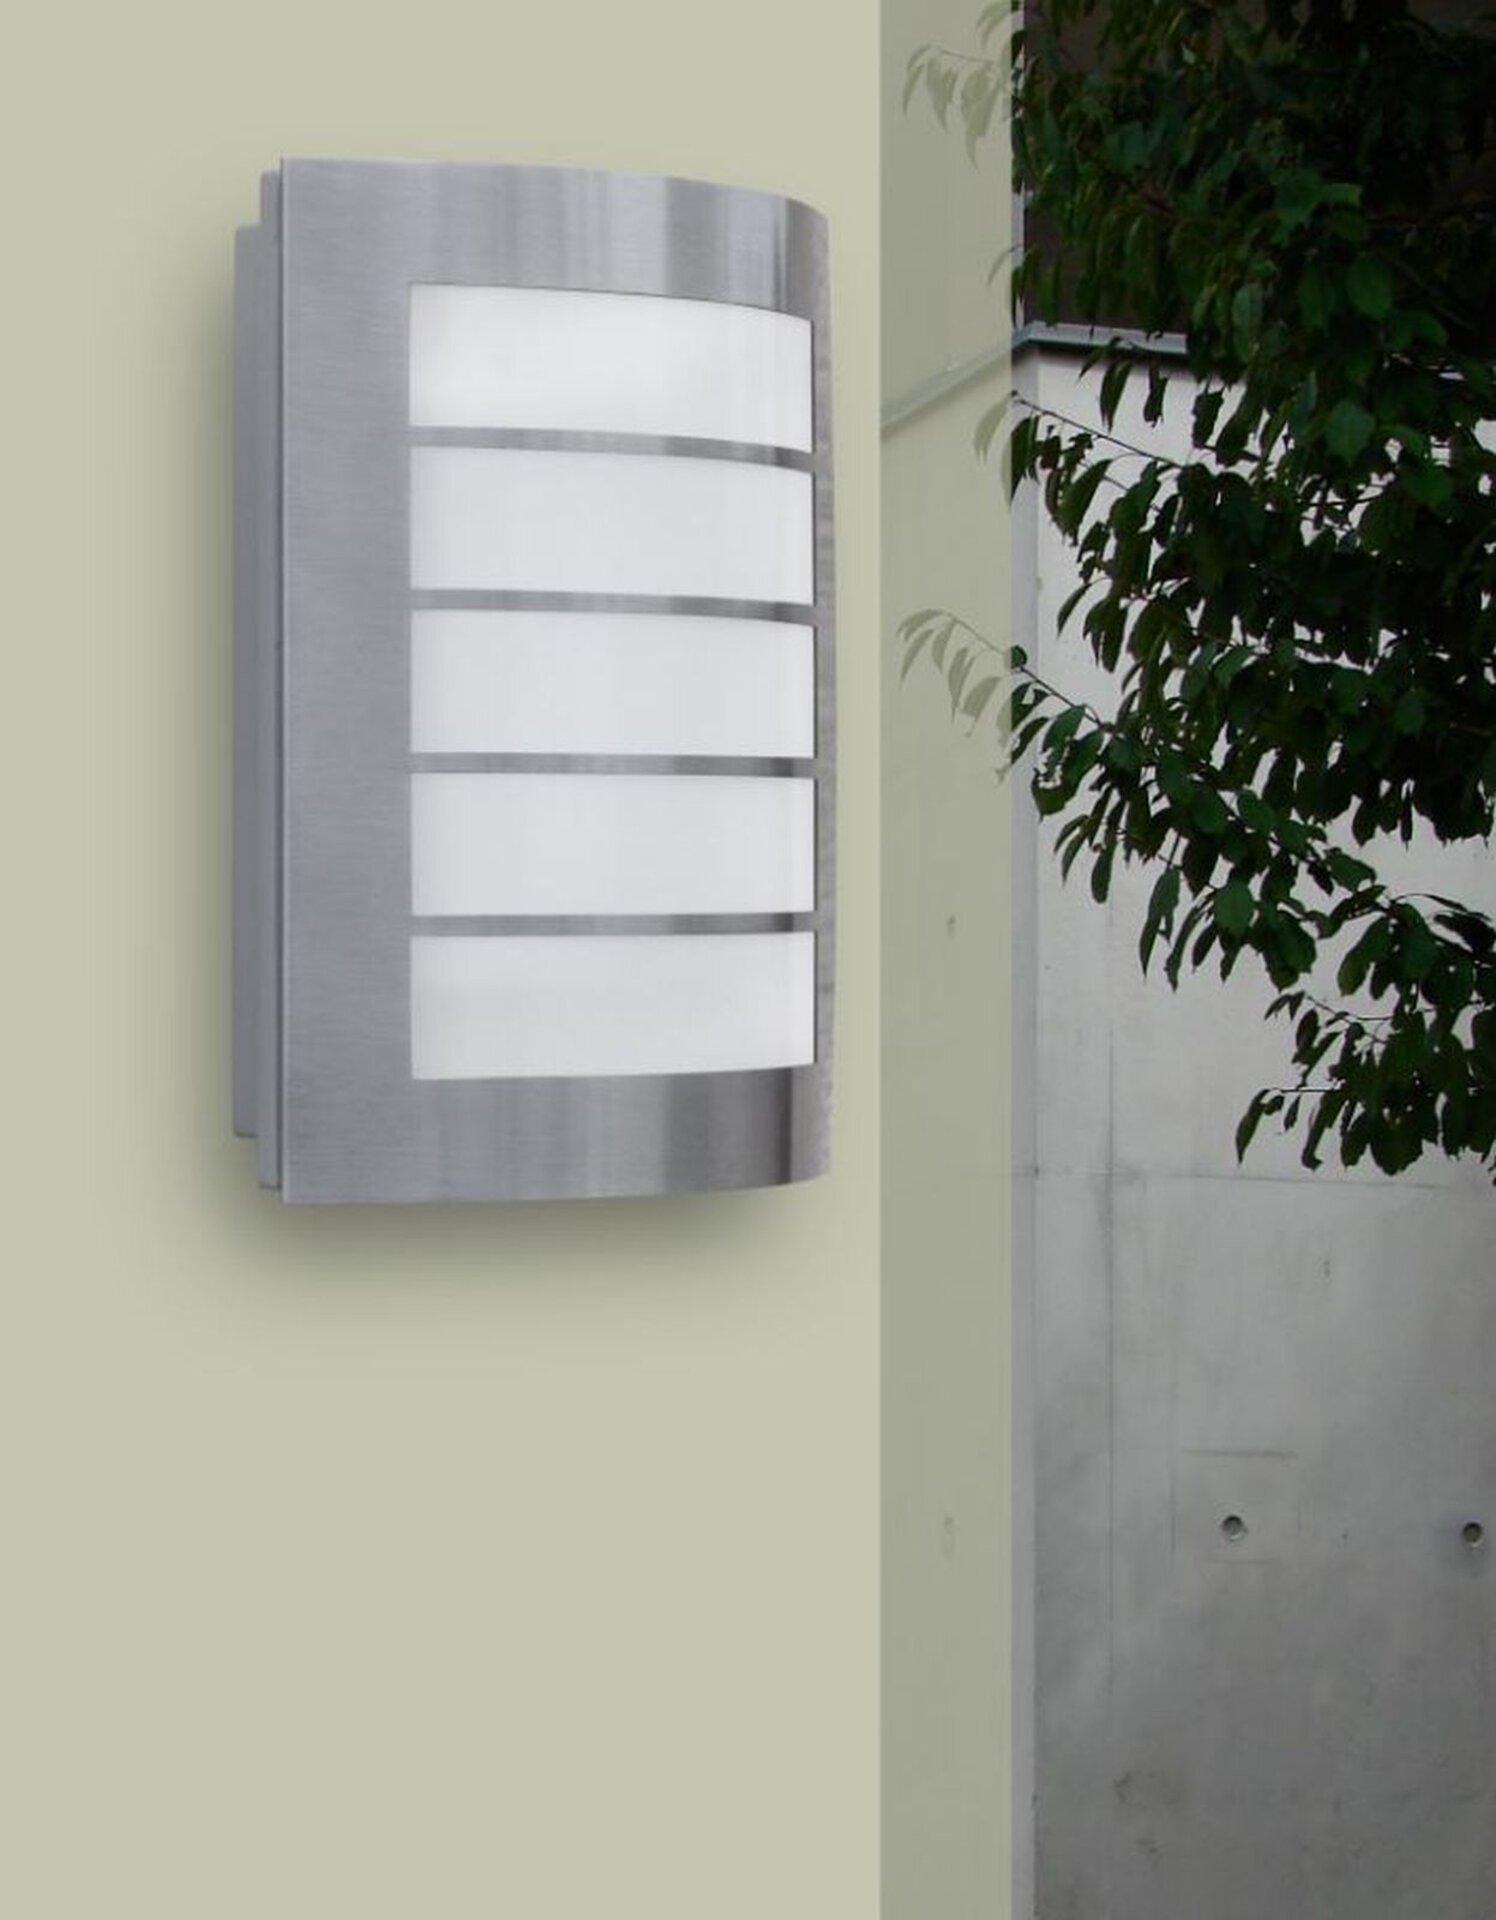 Wand-Aussenleuchte